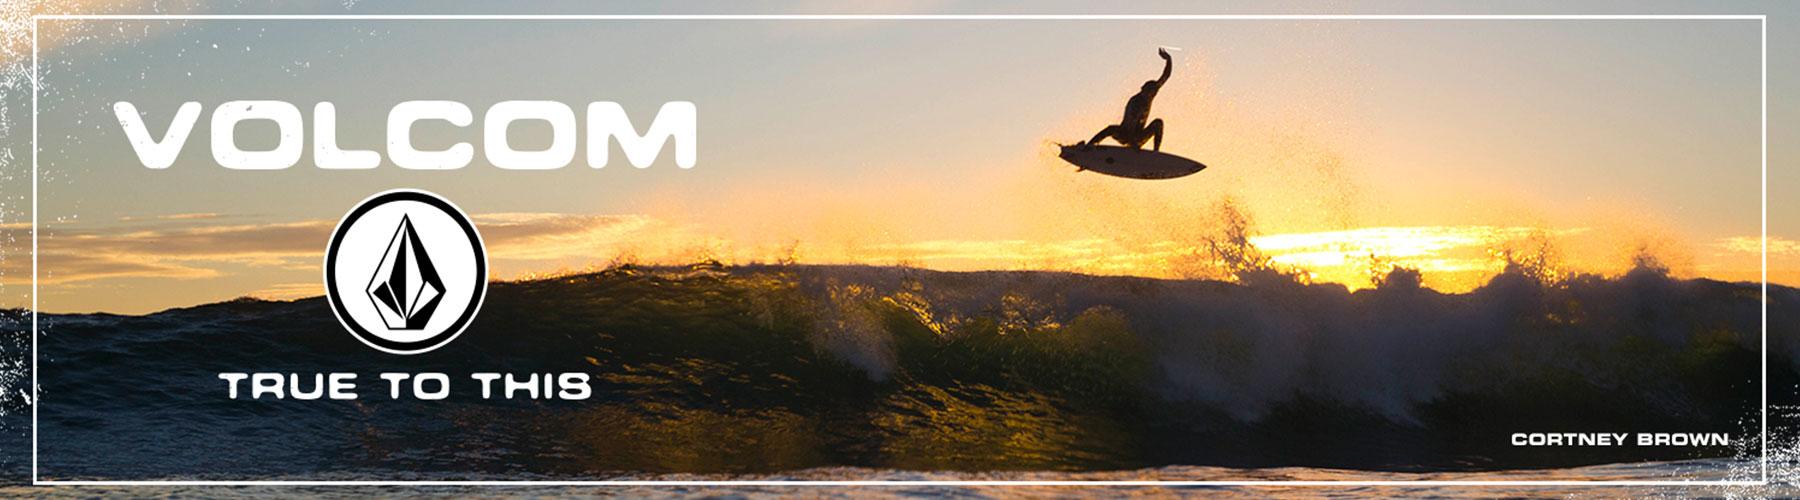 Volcom Surfing